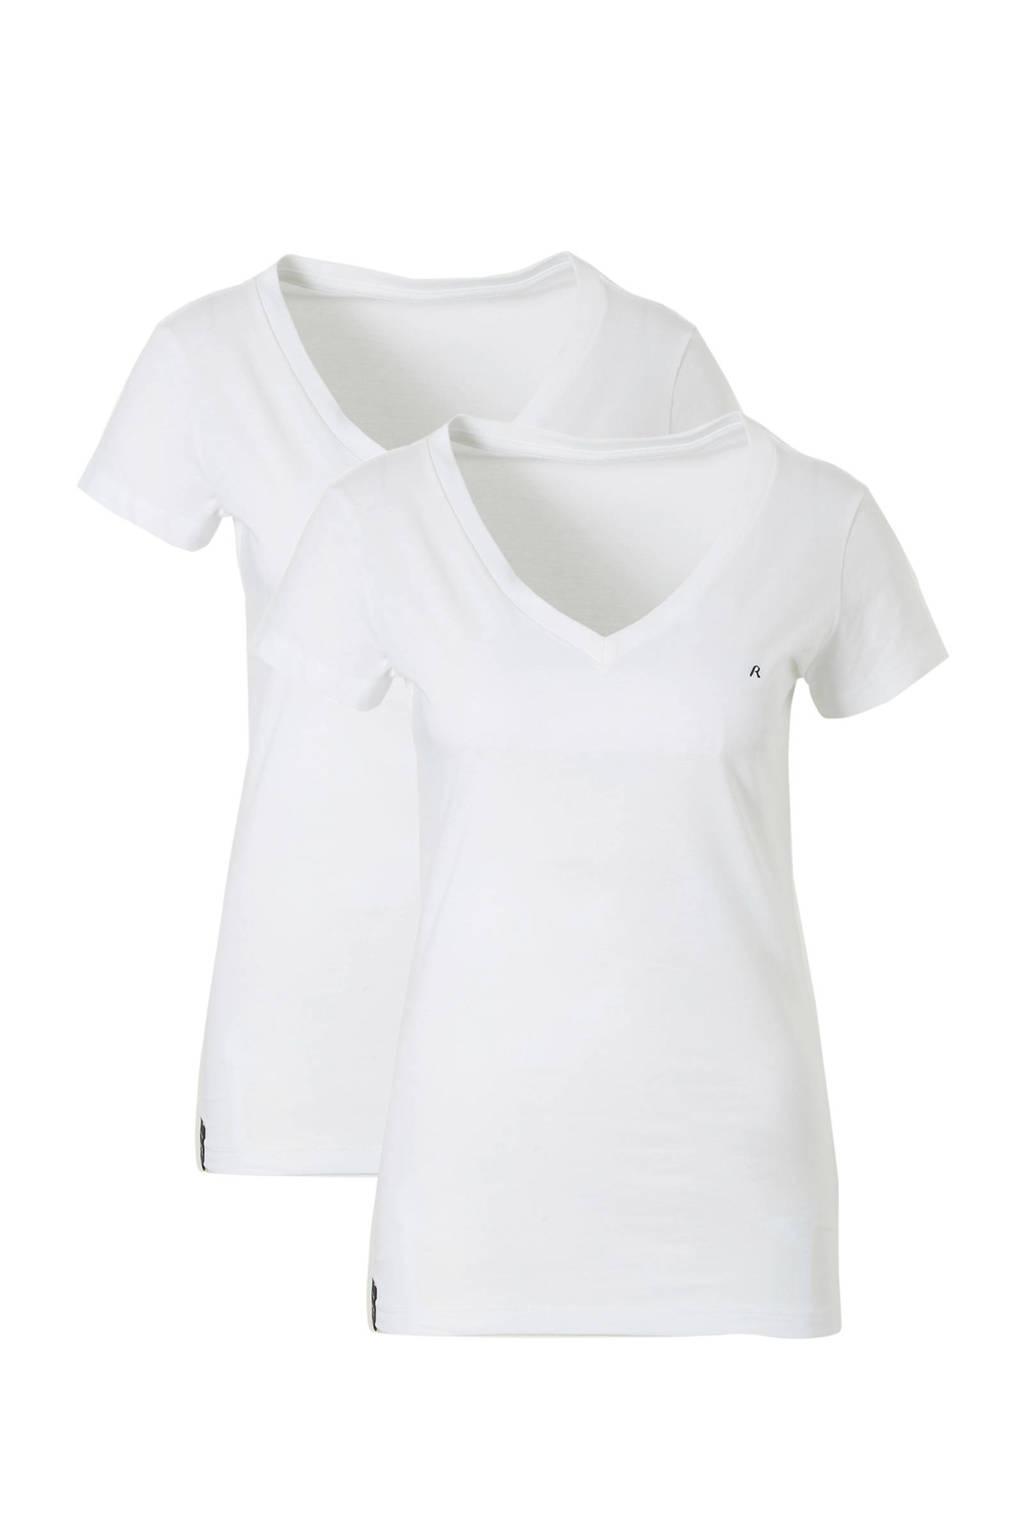 REPLAY T-shirt set van 2, Wit